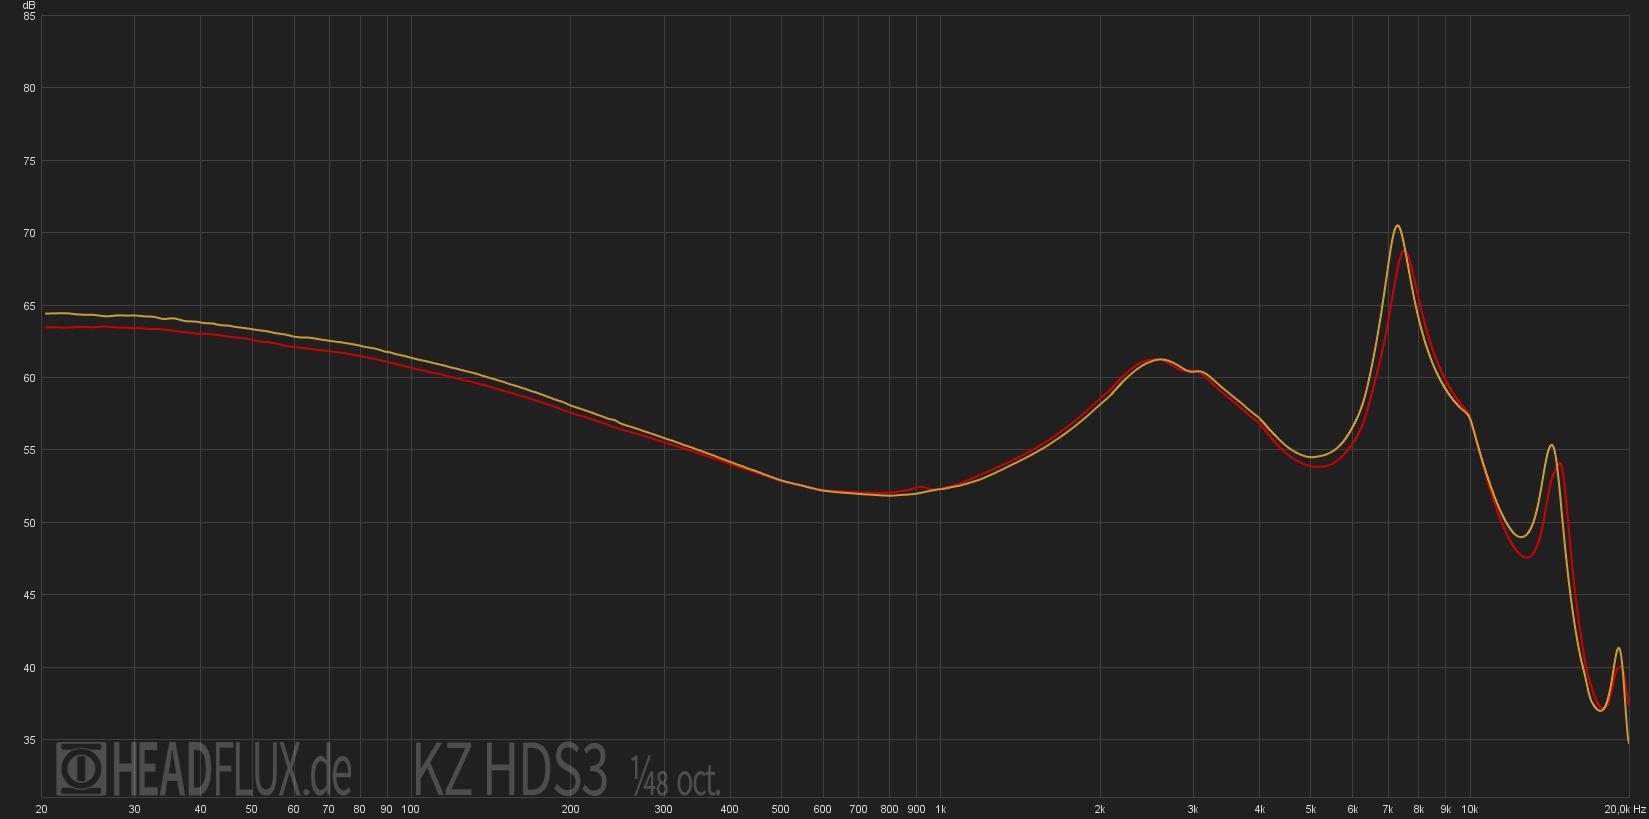 KZ-HDS3-web-1.jpg